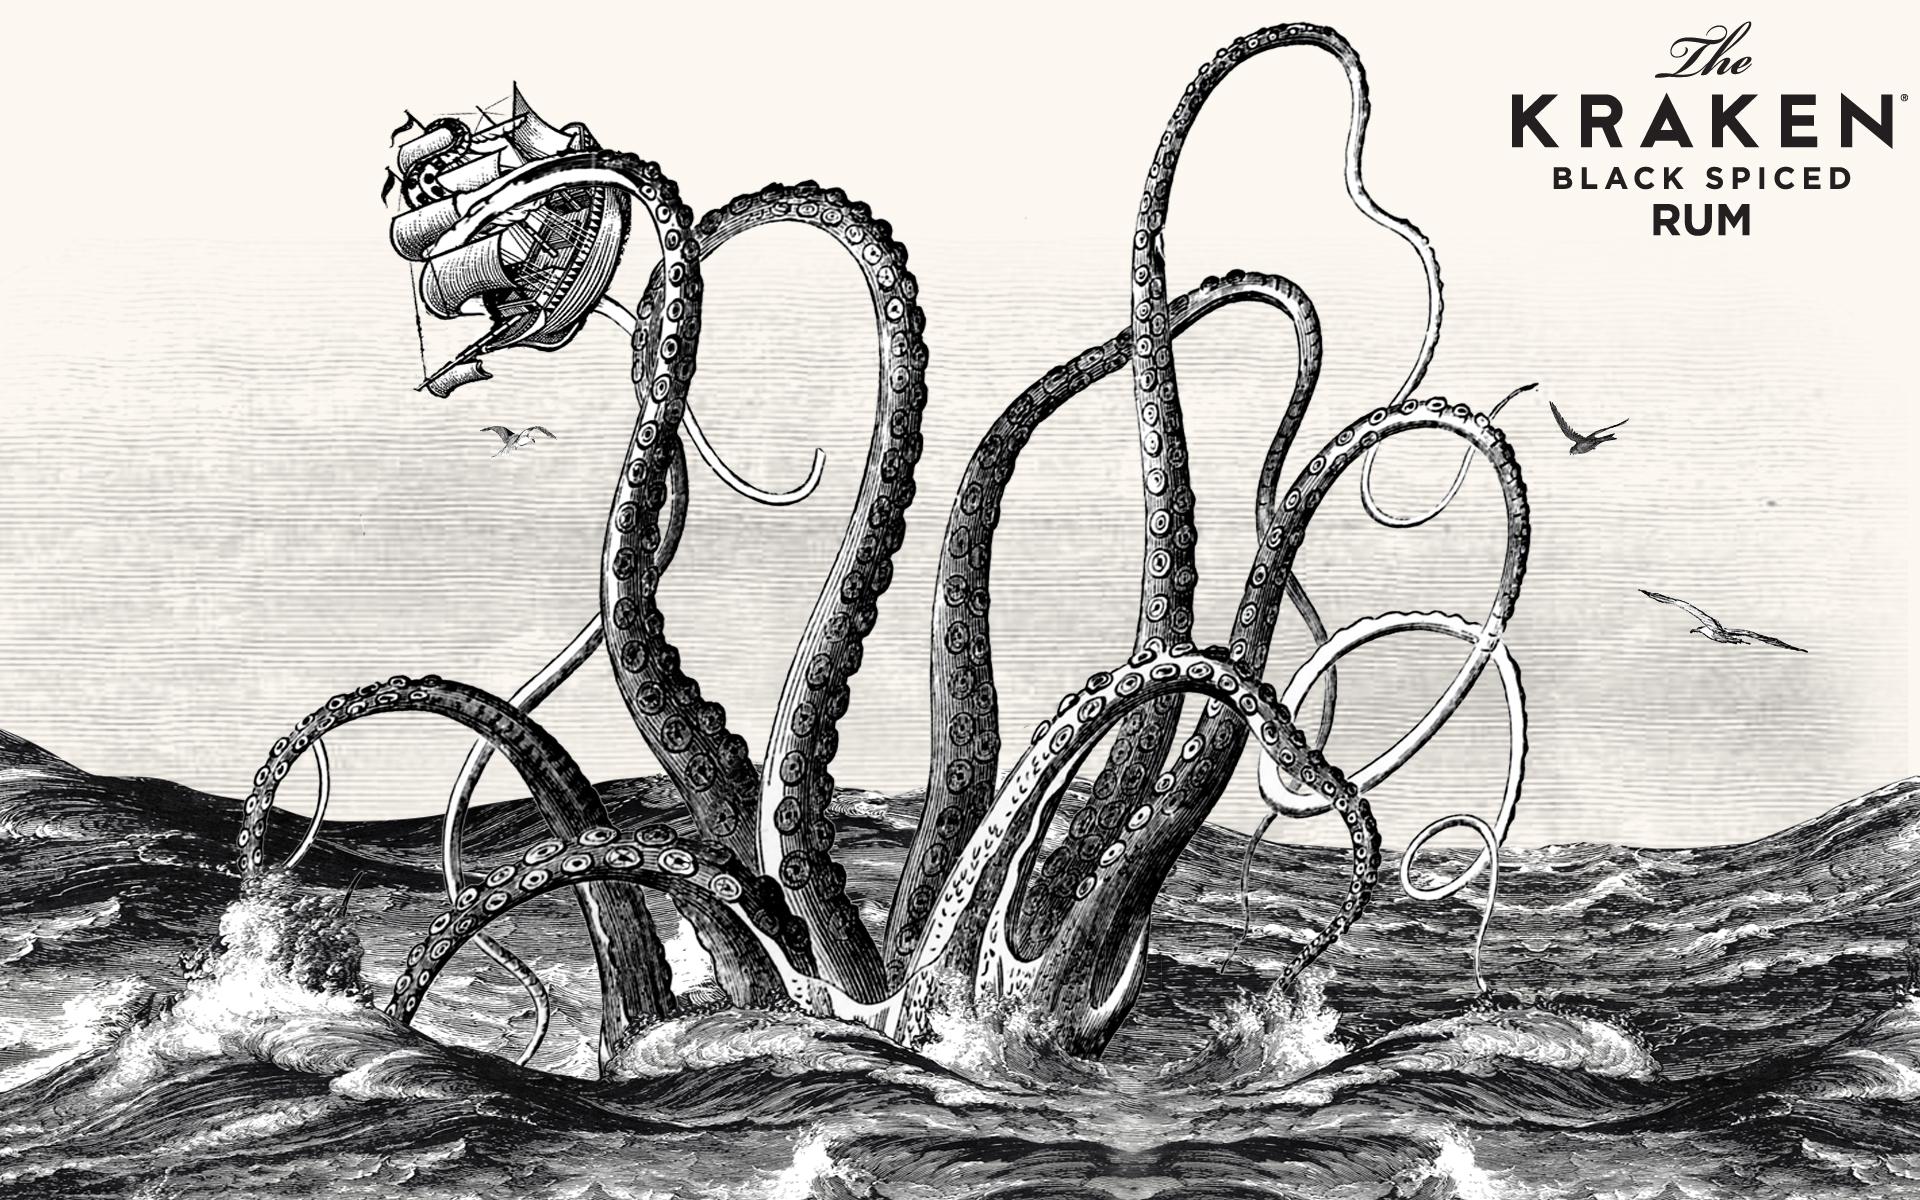 Clash Of The Titans Kraken iPhone Wallpaper HD Free Download